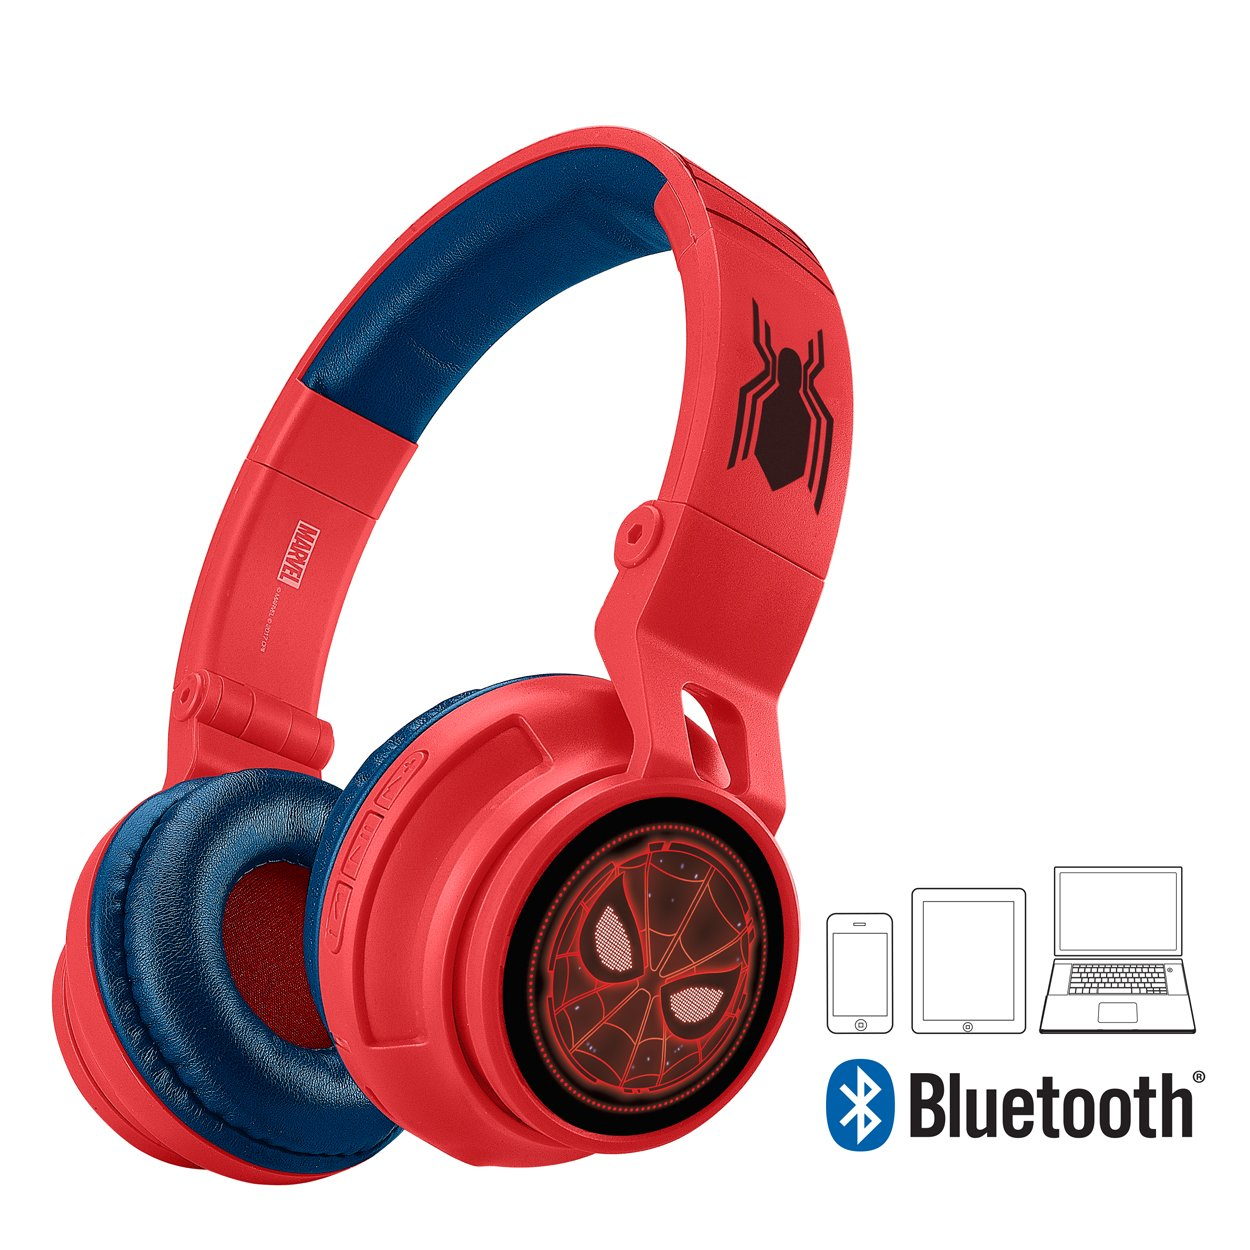 Spiderman Bluetooth Headphones for Kids Wireless Rechargeable Kid Friendly Sound (Spiderman) by eKids